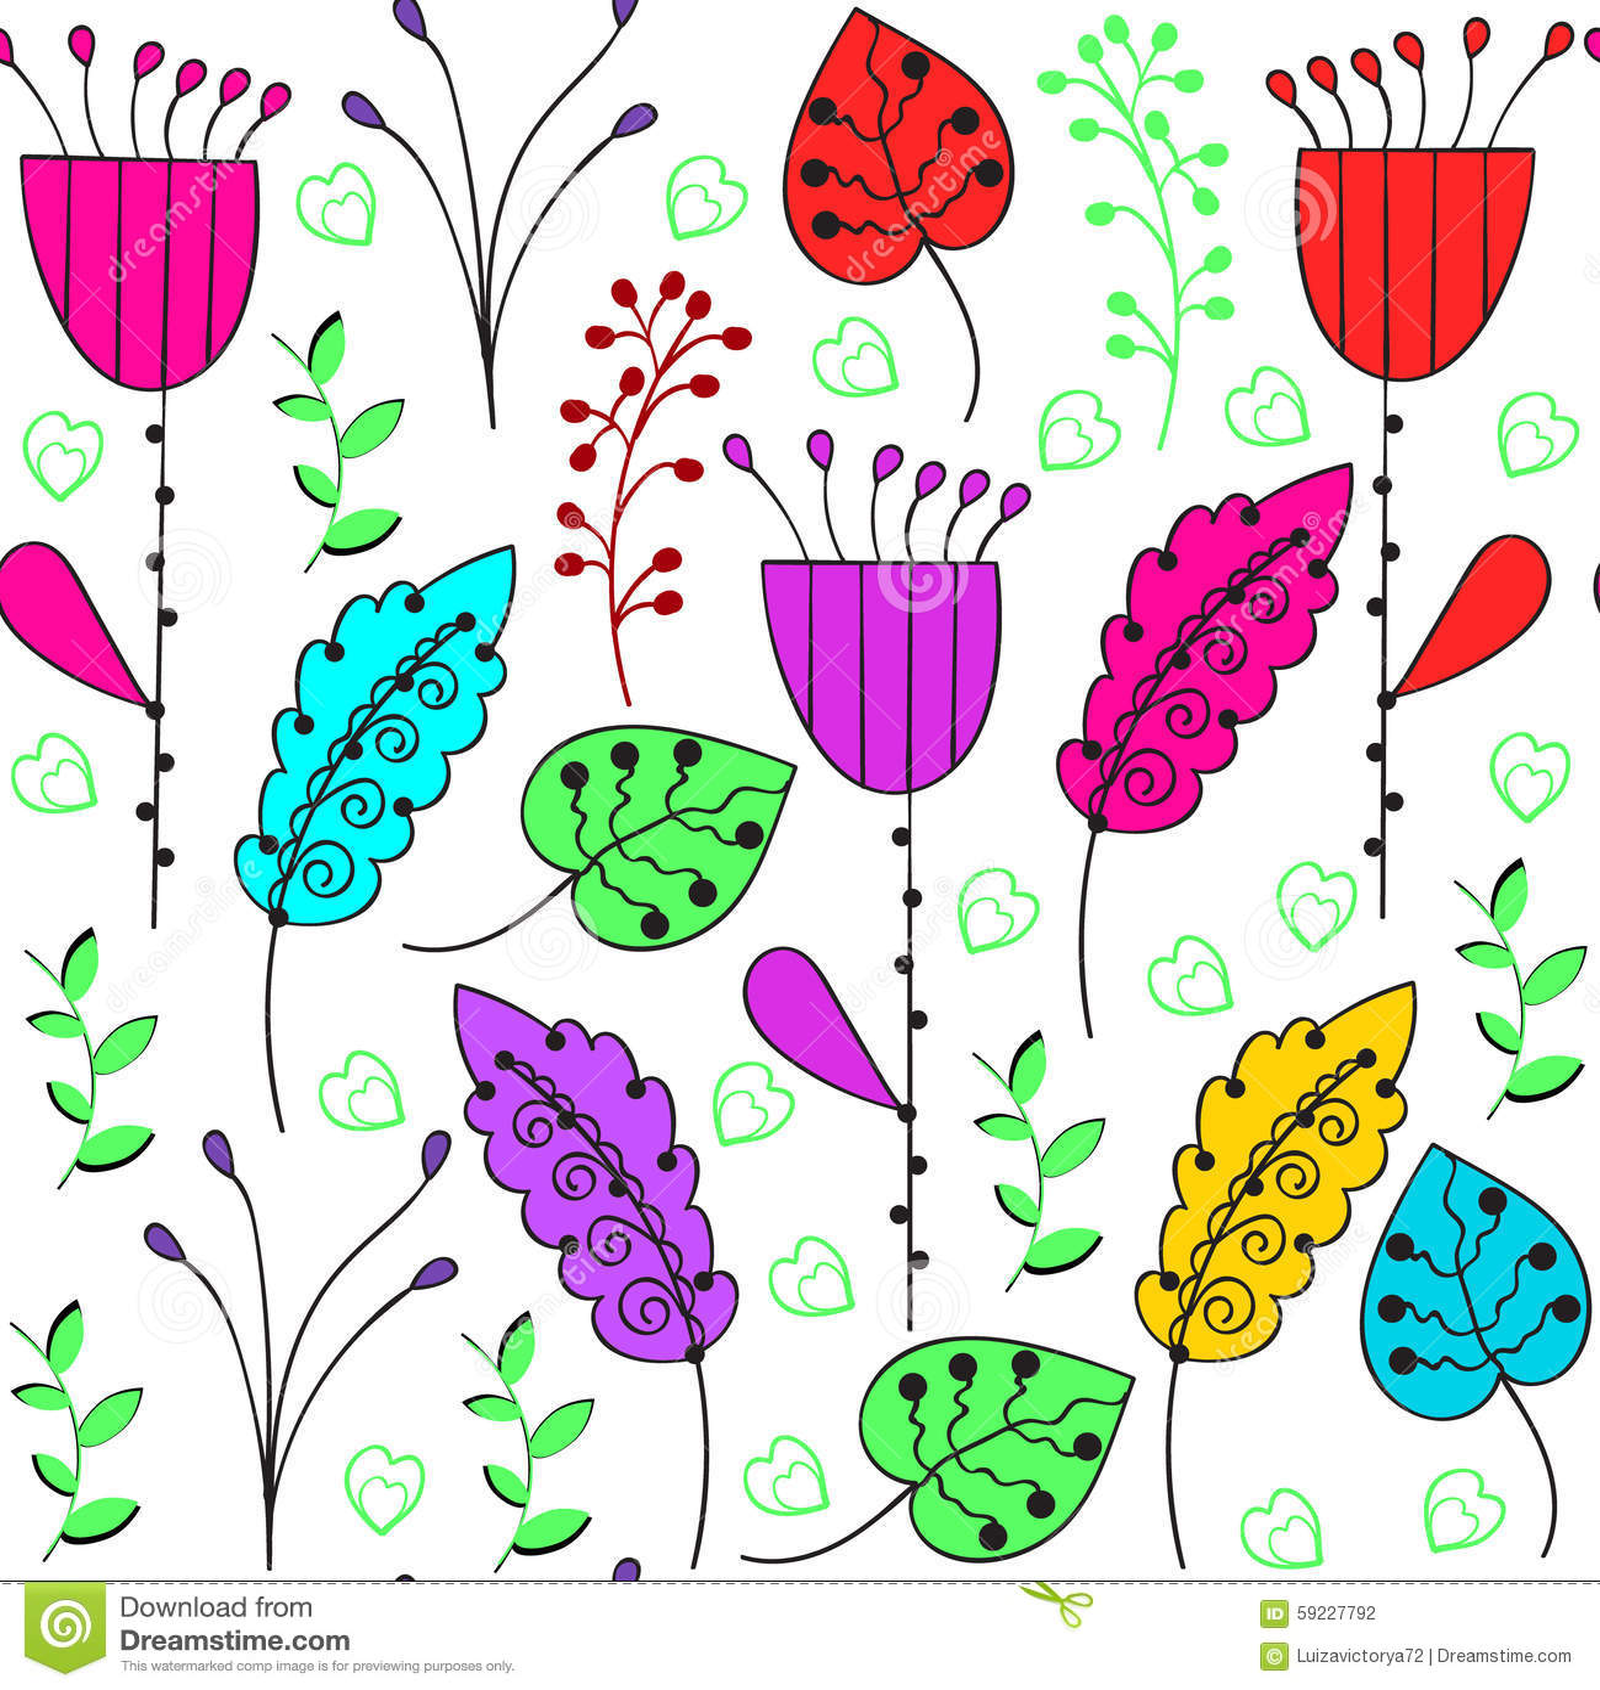 Modelo inconsútil colorido floral y modelo inconsútil en muestra